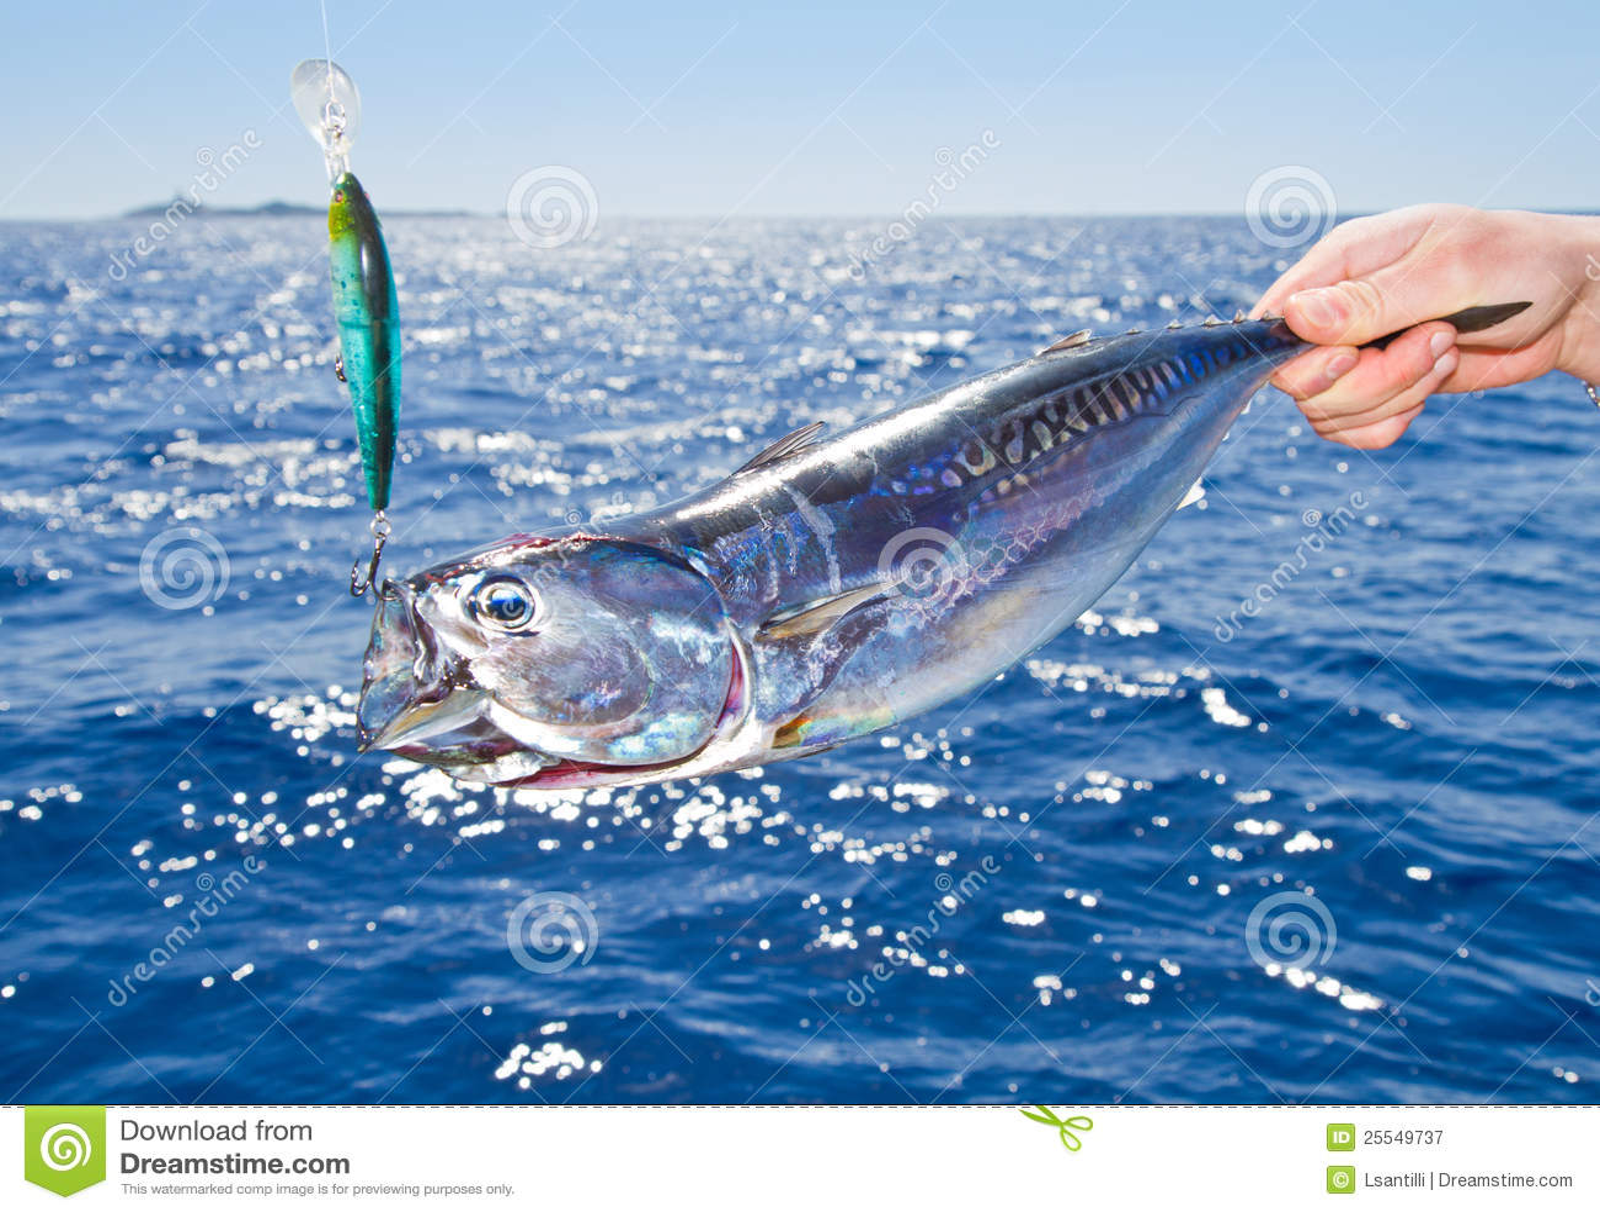 Tuna mediterranean big game fishing royalty free stock for Tuna fishing games